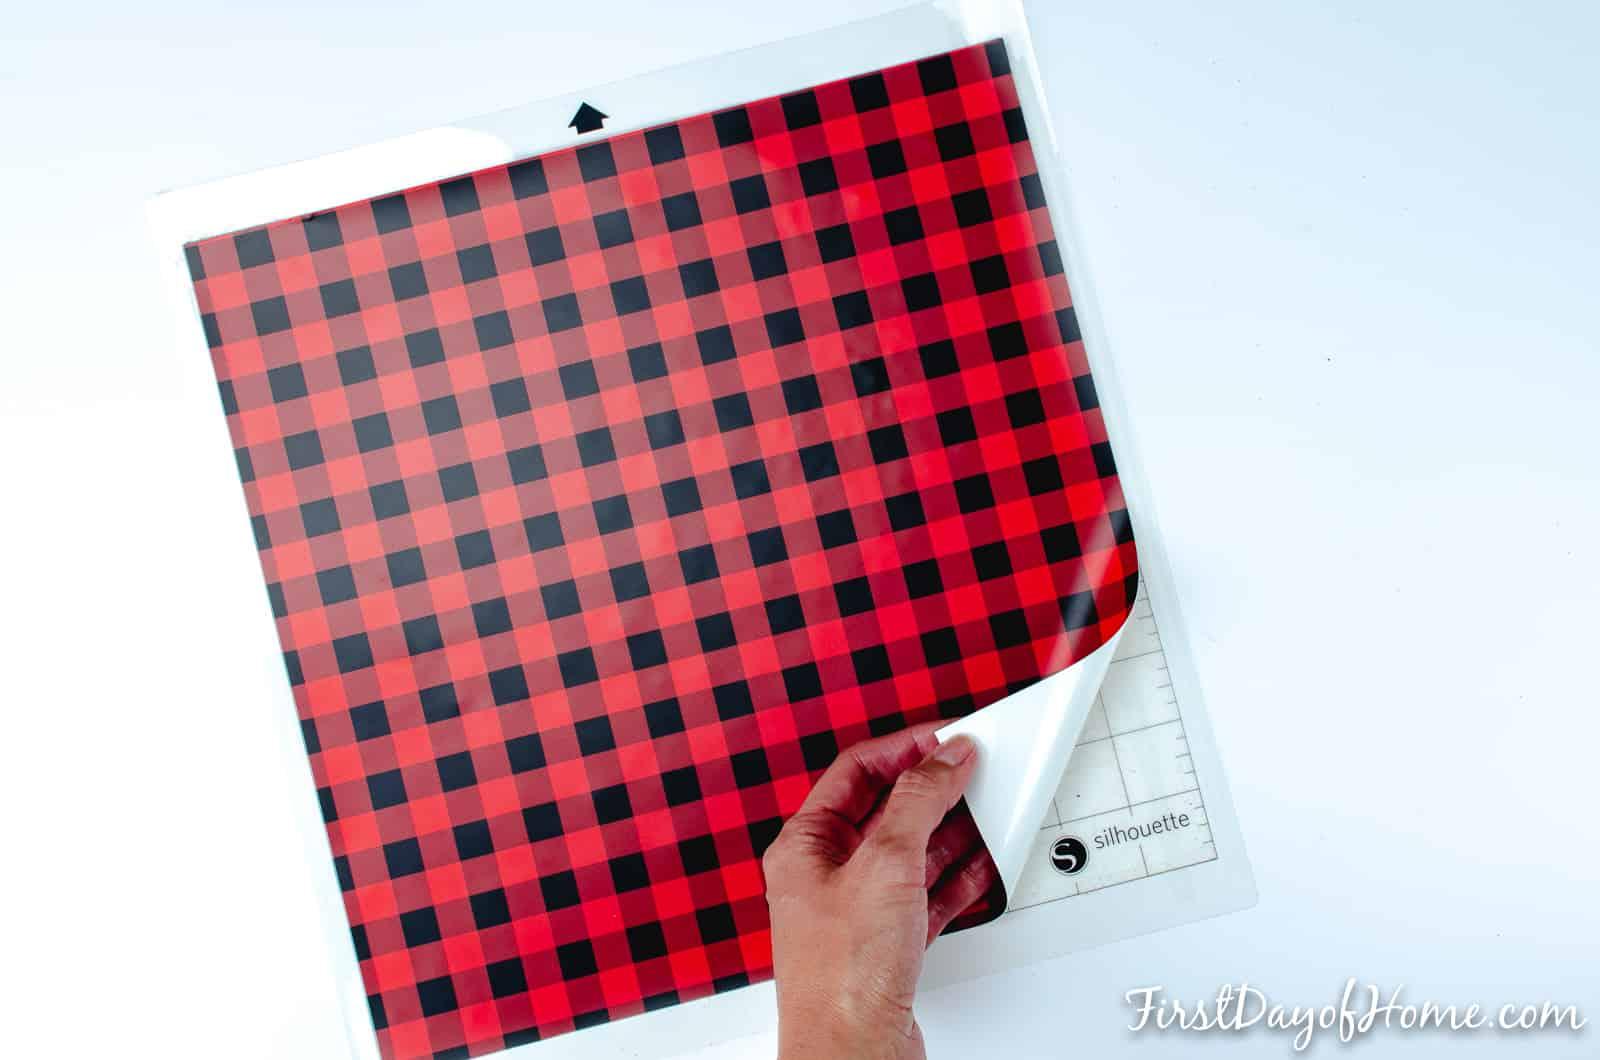 Placing buffalo plaid heat transfer vinyl on Silhouette Cameo cutting mat to make Valentine's Day DIY shirt